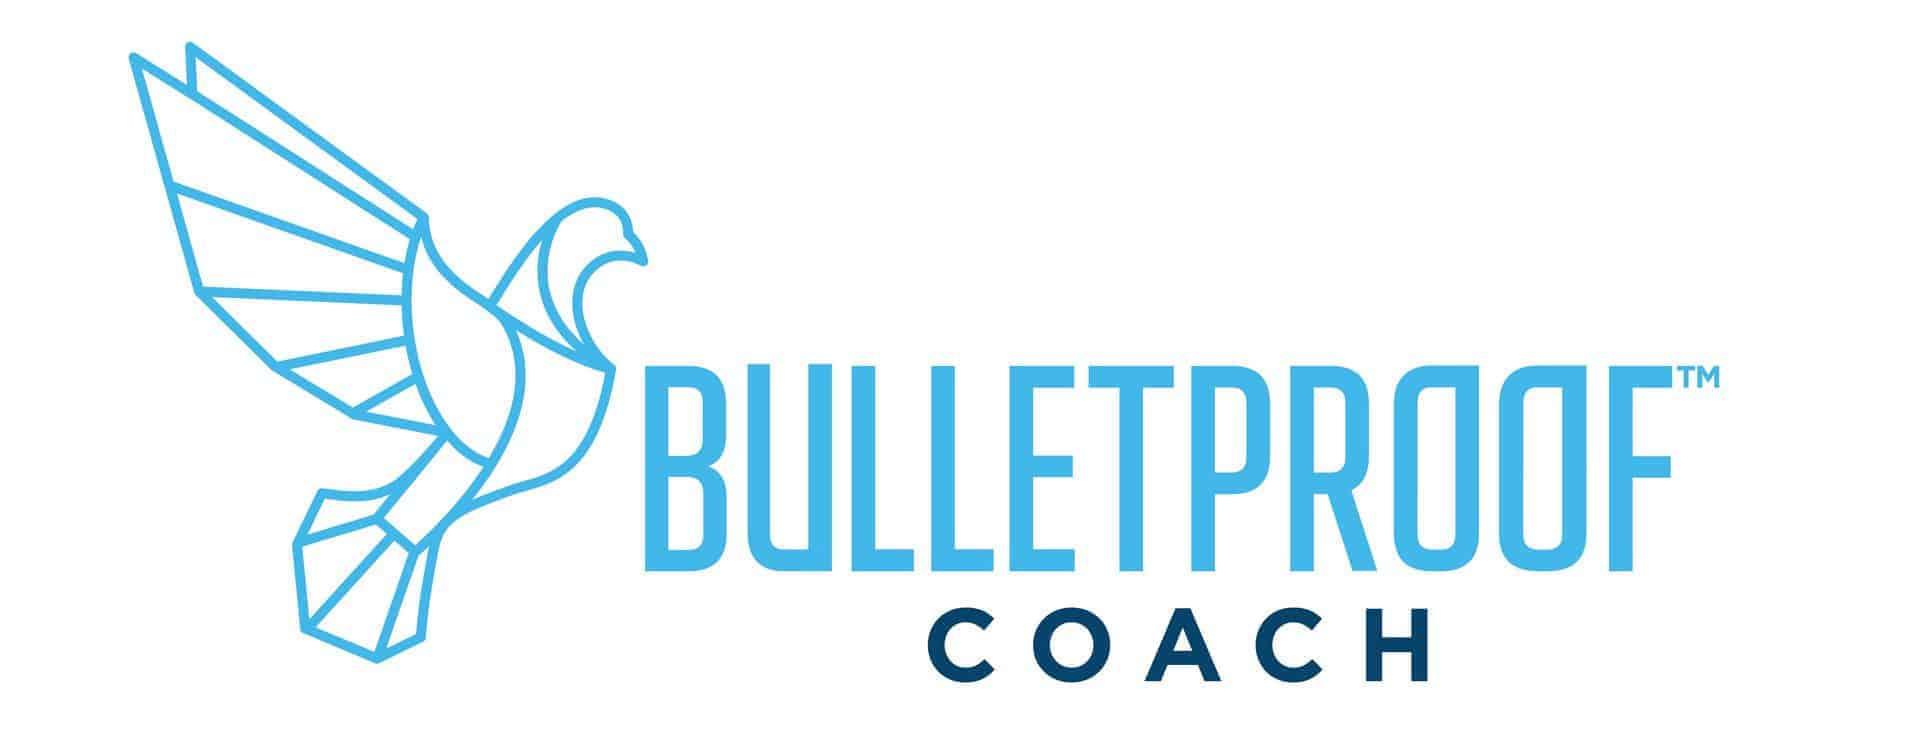 bulletproof coach program